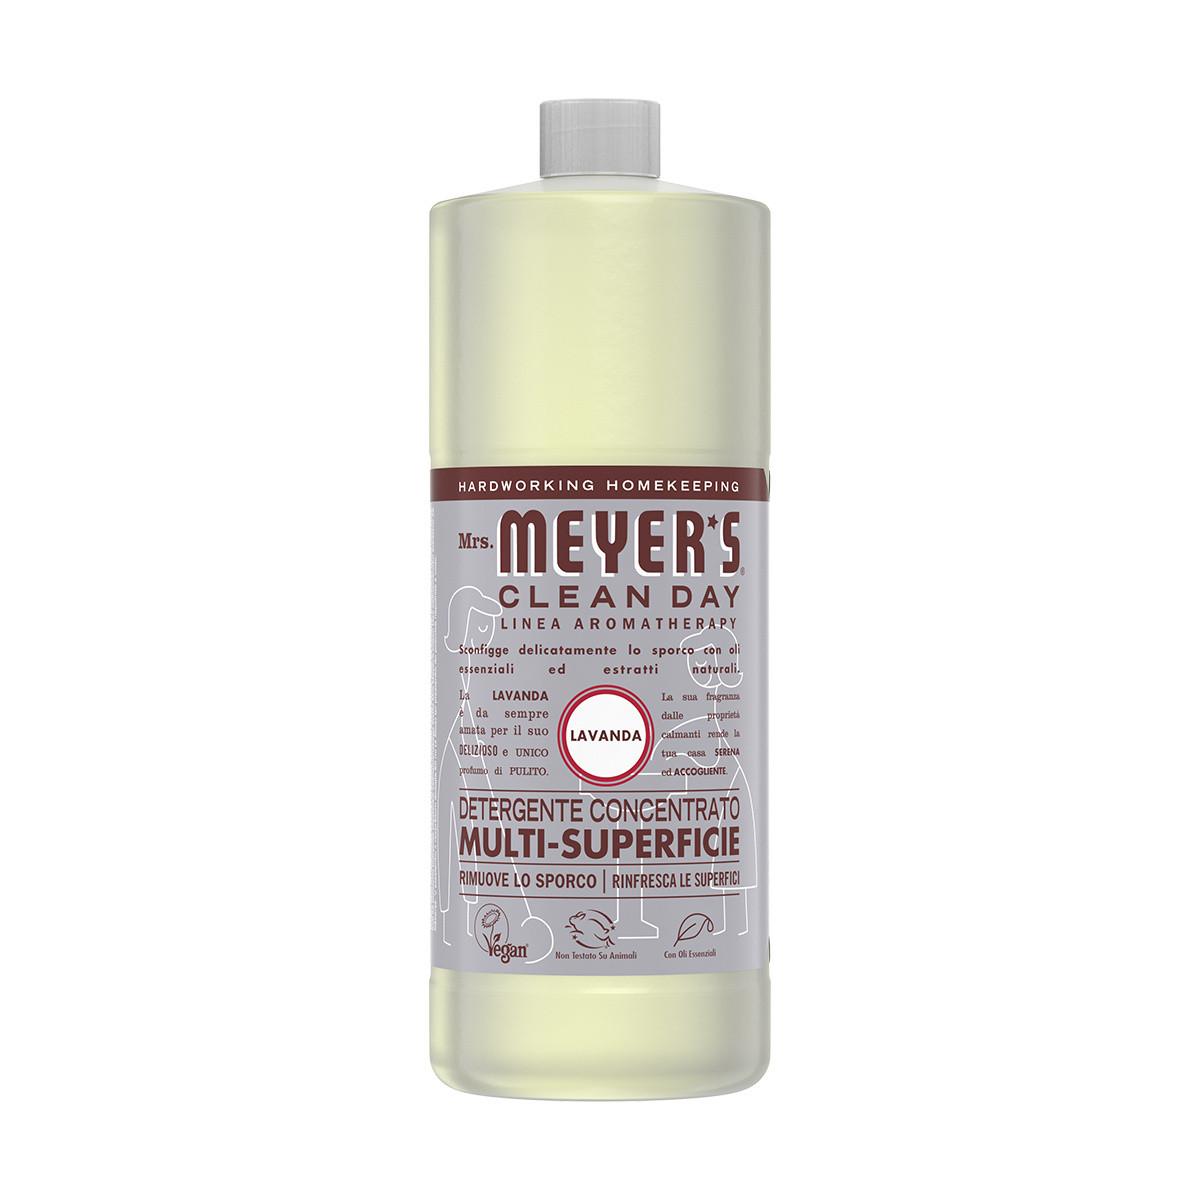 Detergente concentrato multi-supericie profumo di lavanda 946ml, Grigio, large image number 0